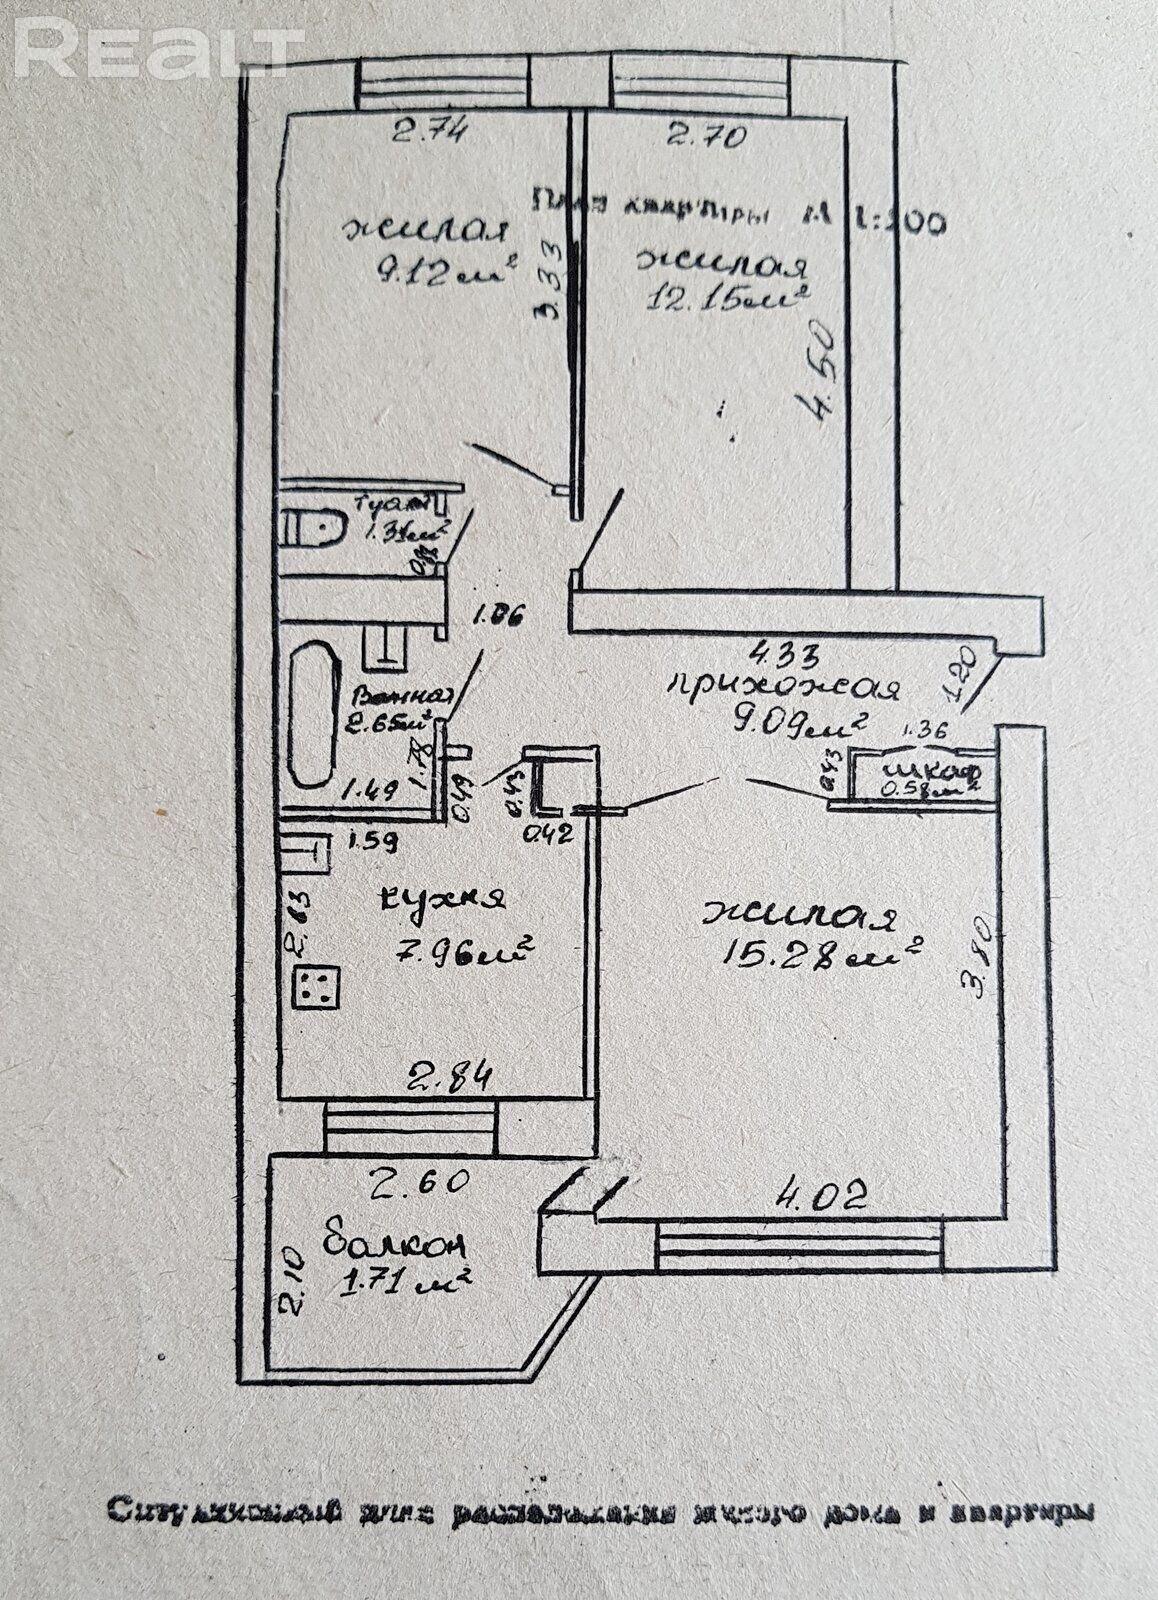 Продажа 3-х комнатной квартиры в г. Ветке, ул. Батракова, дом 26. Цена 60 385 руб c торгом